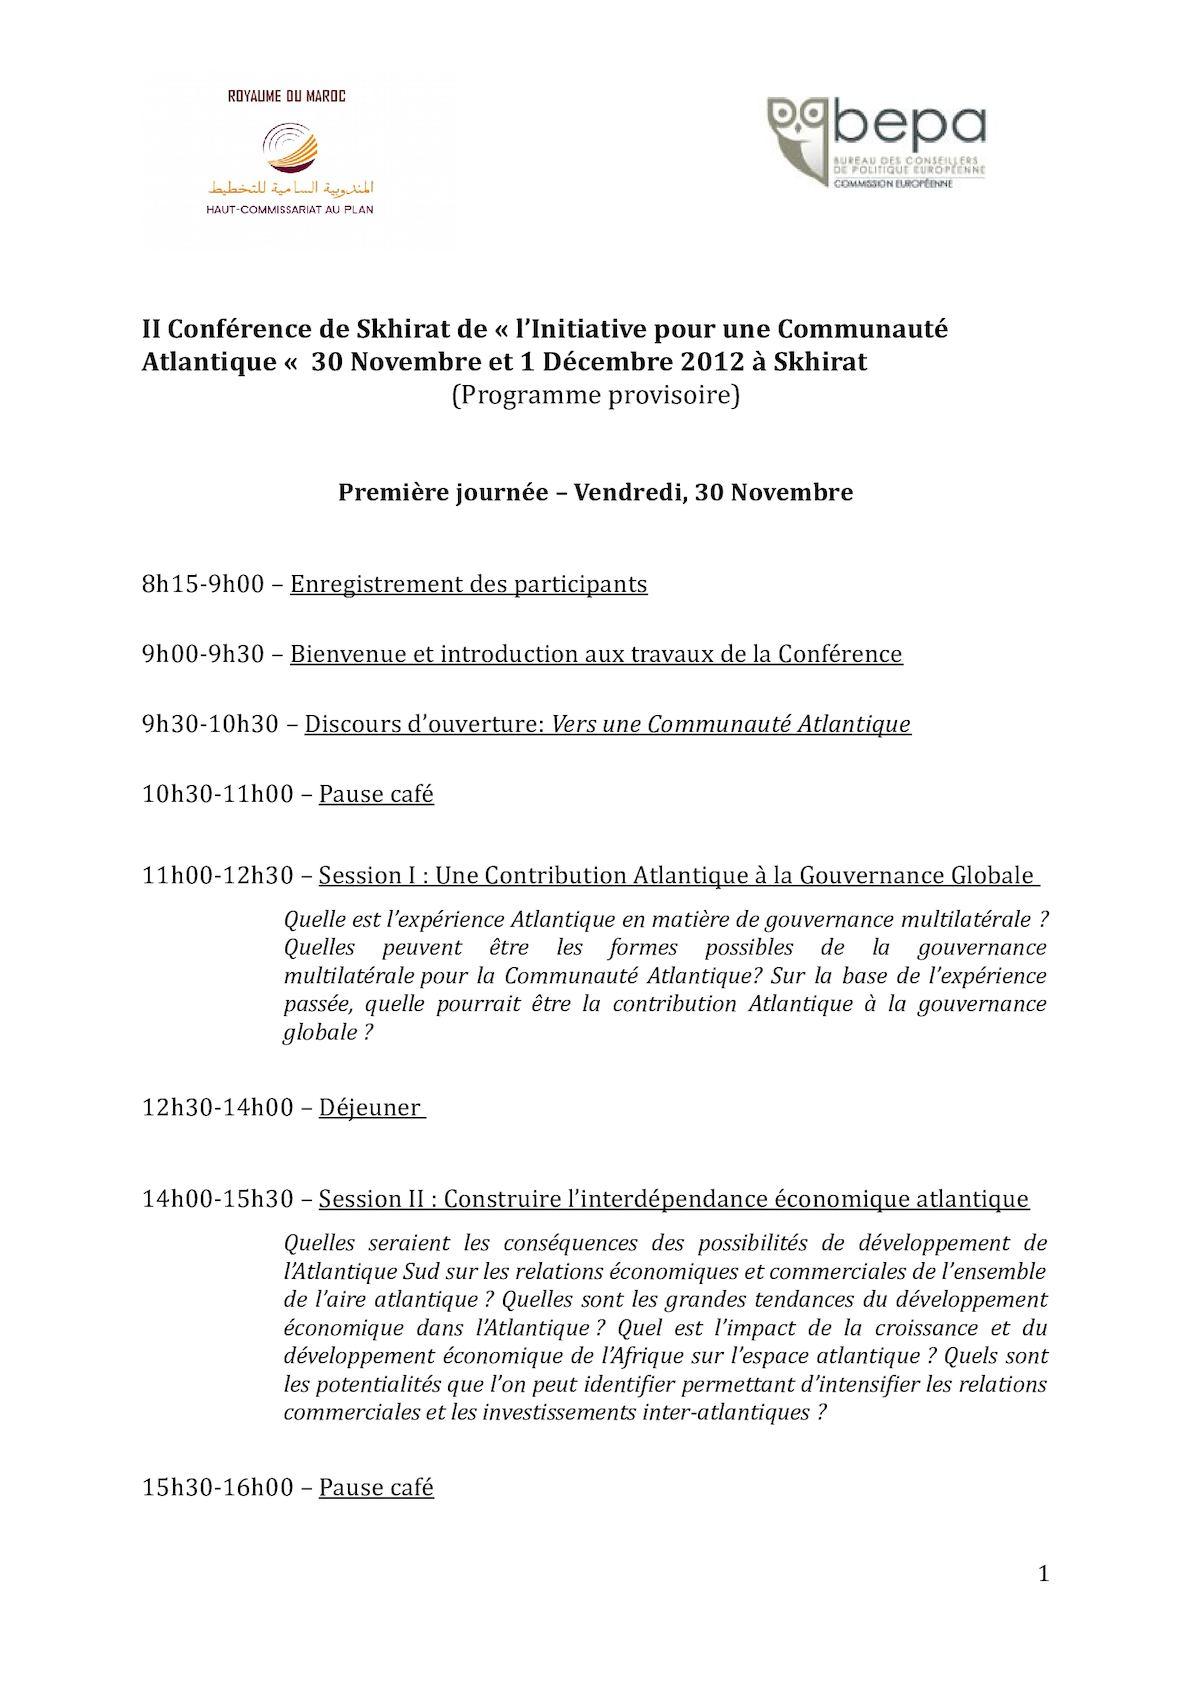 Programme Provisoire Hcp (FR).